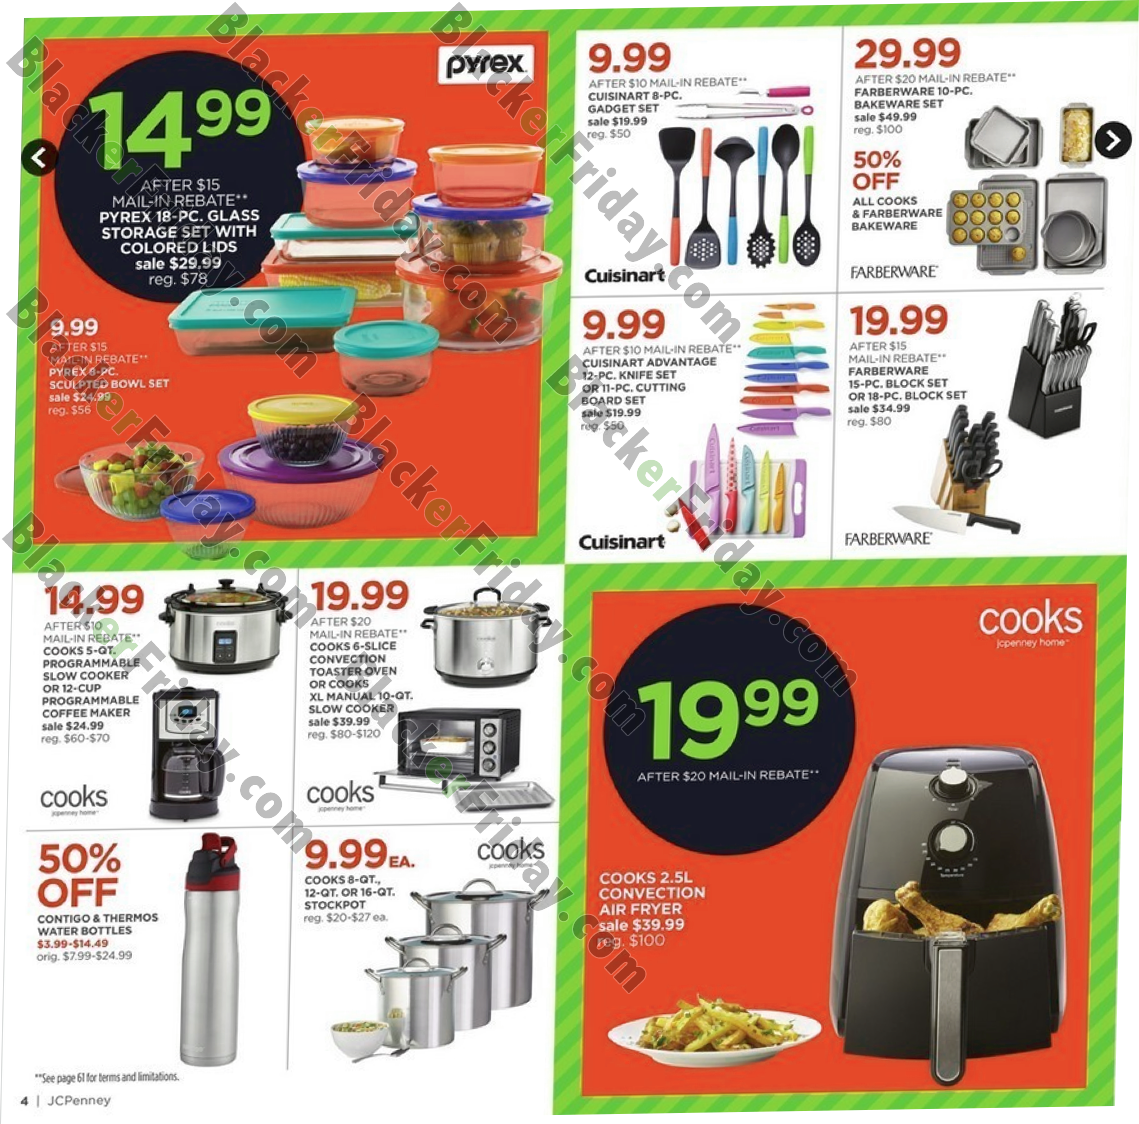 Black Friday Target 2017 Ads >> JCPenney Black Friday 2018 Ad Scan & Deals - Blacker Friday